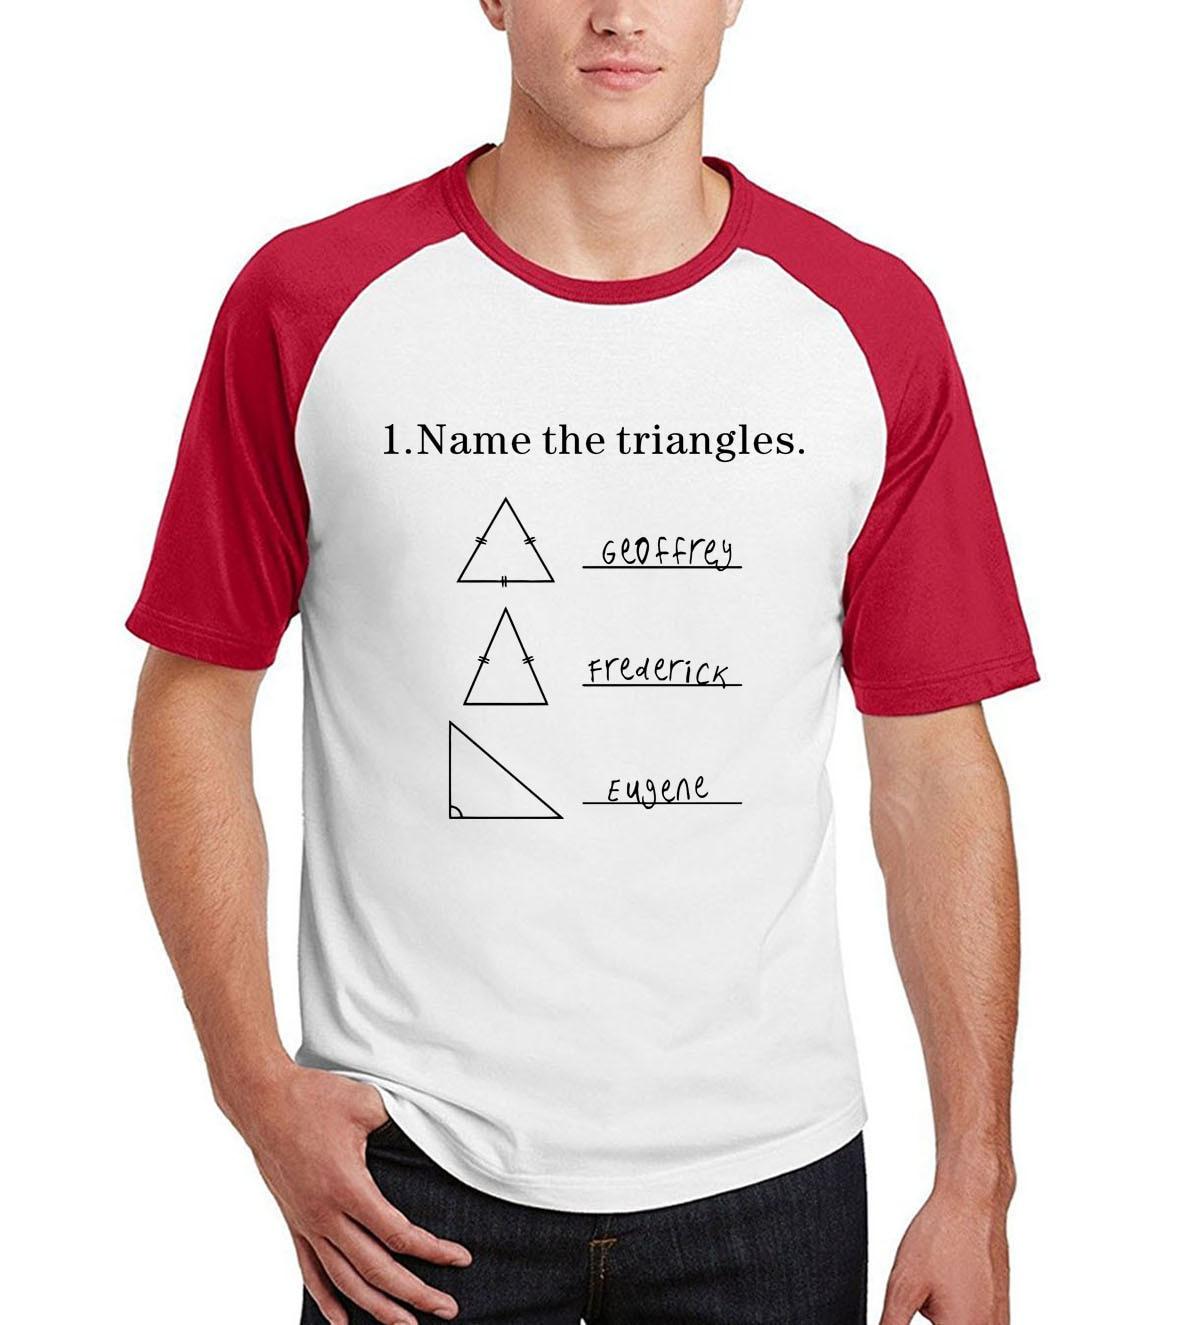 1fb4f0b9a Hombres Camiseta de algodón de manga corta camisetas de verano de ...